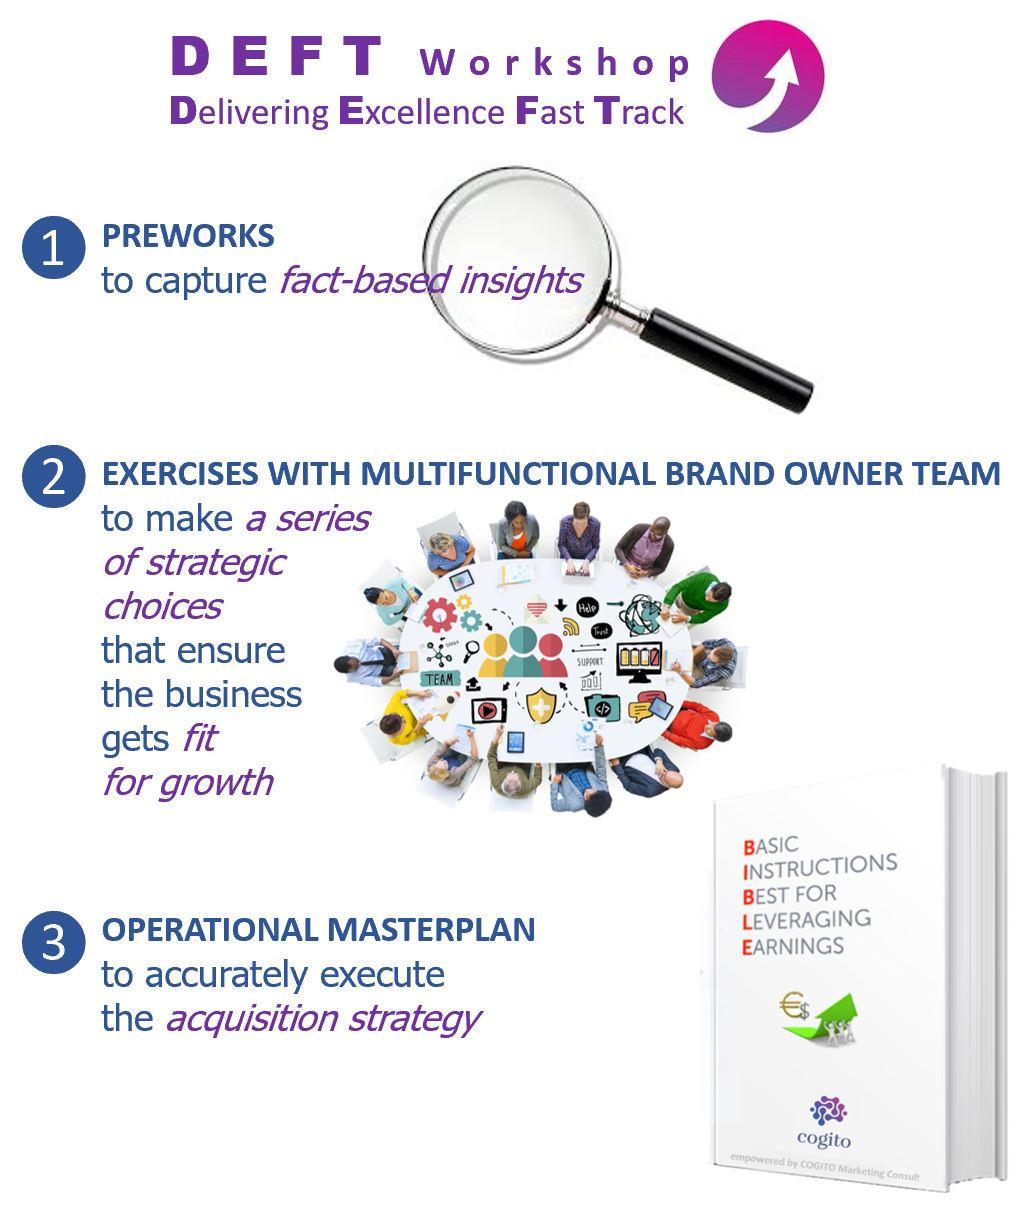 Description of DEFT Workshop with focus on acquisition strategy